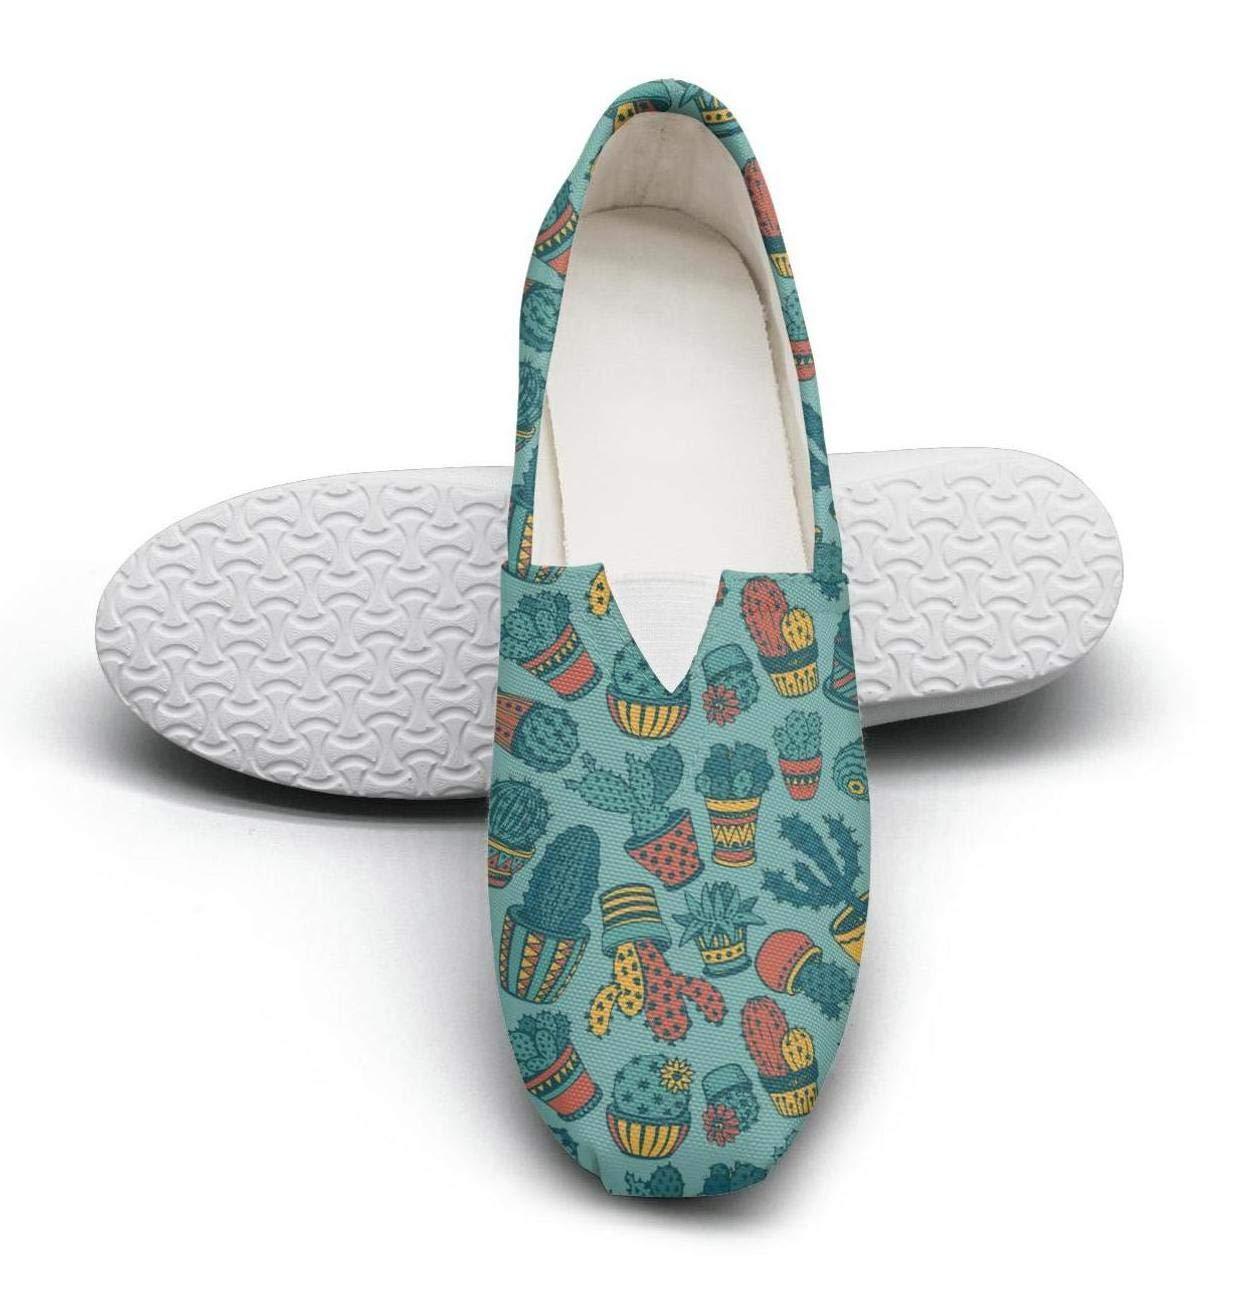 FGBLK Lace-Free Canvas Elegant Cactus Charm Women Sneakers Comfortable Flat Shoe Skates